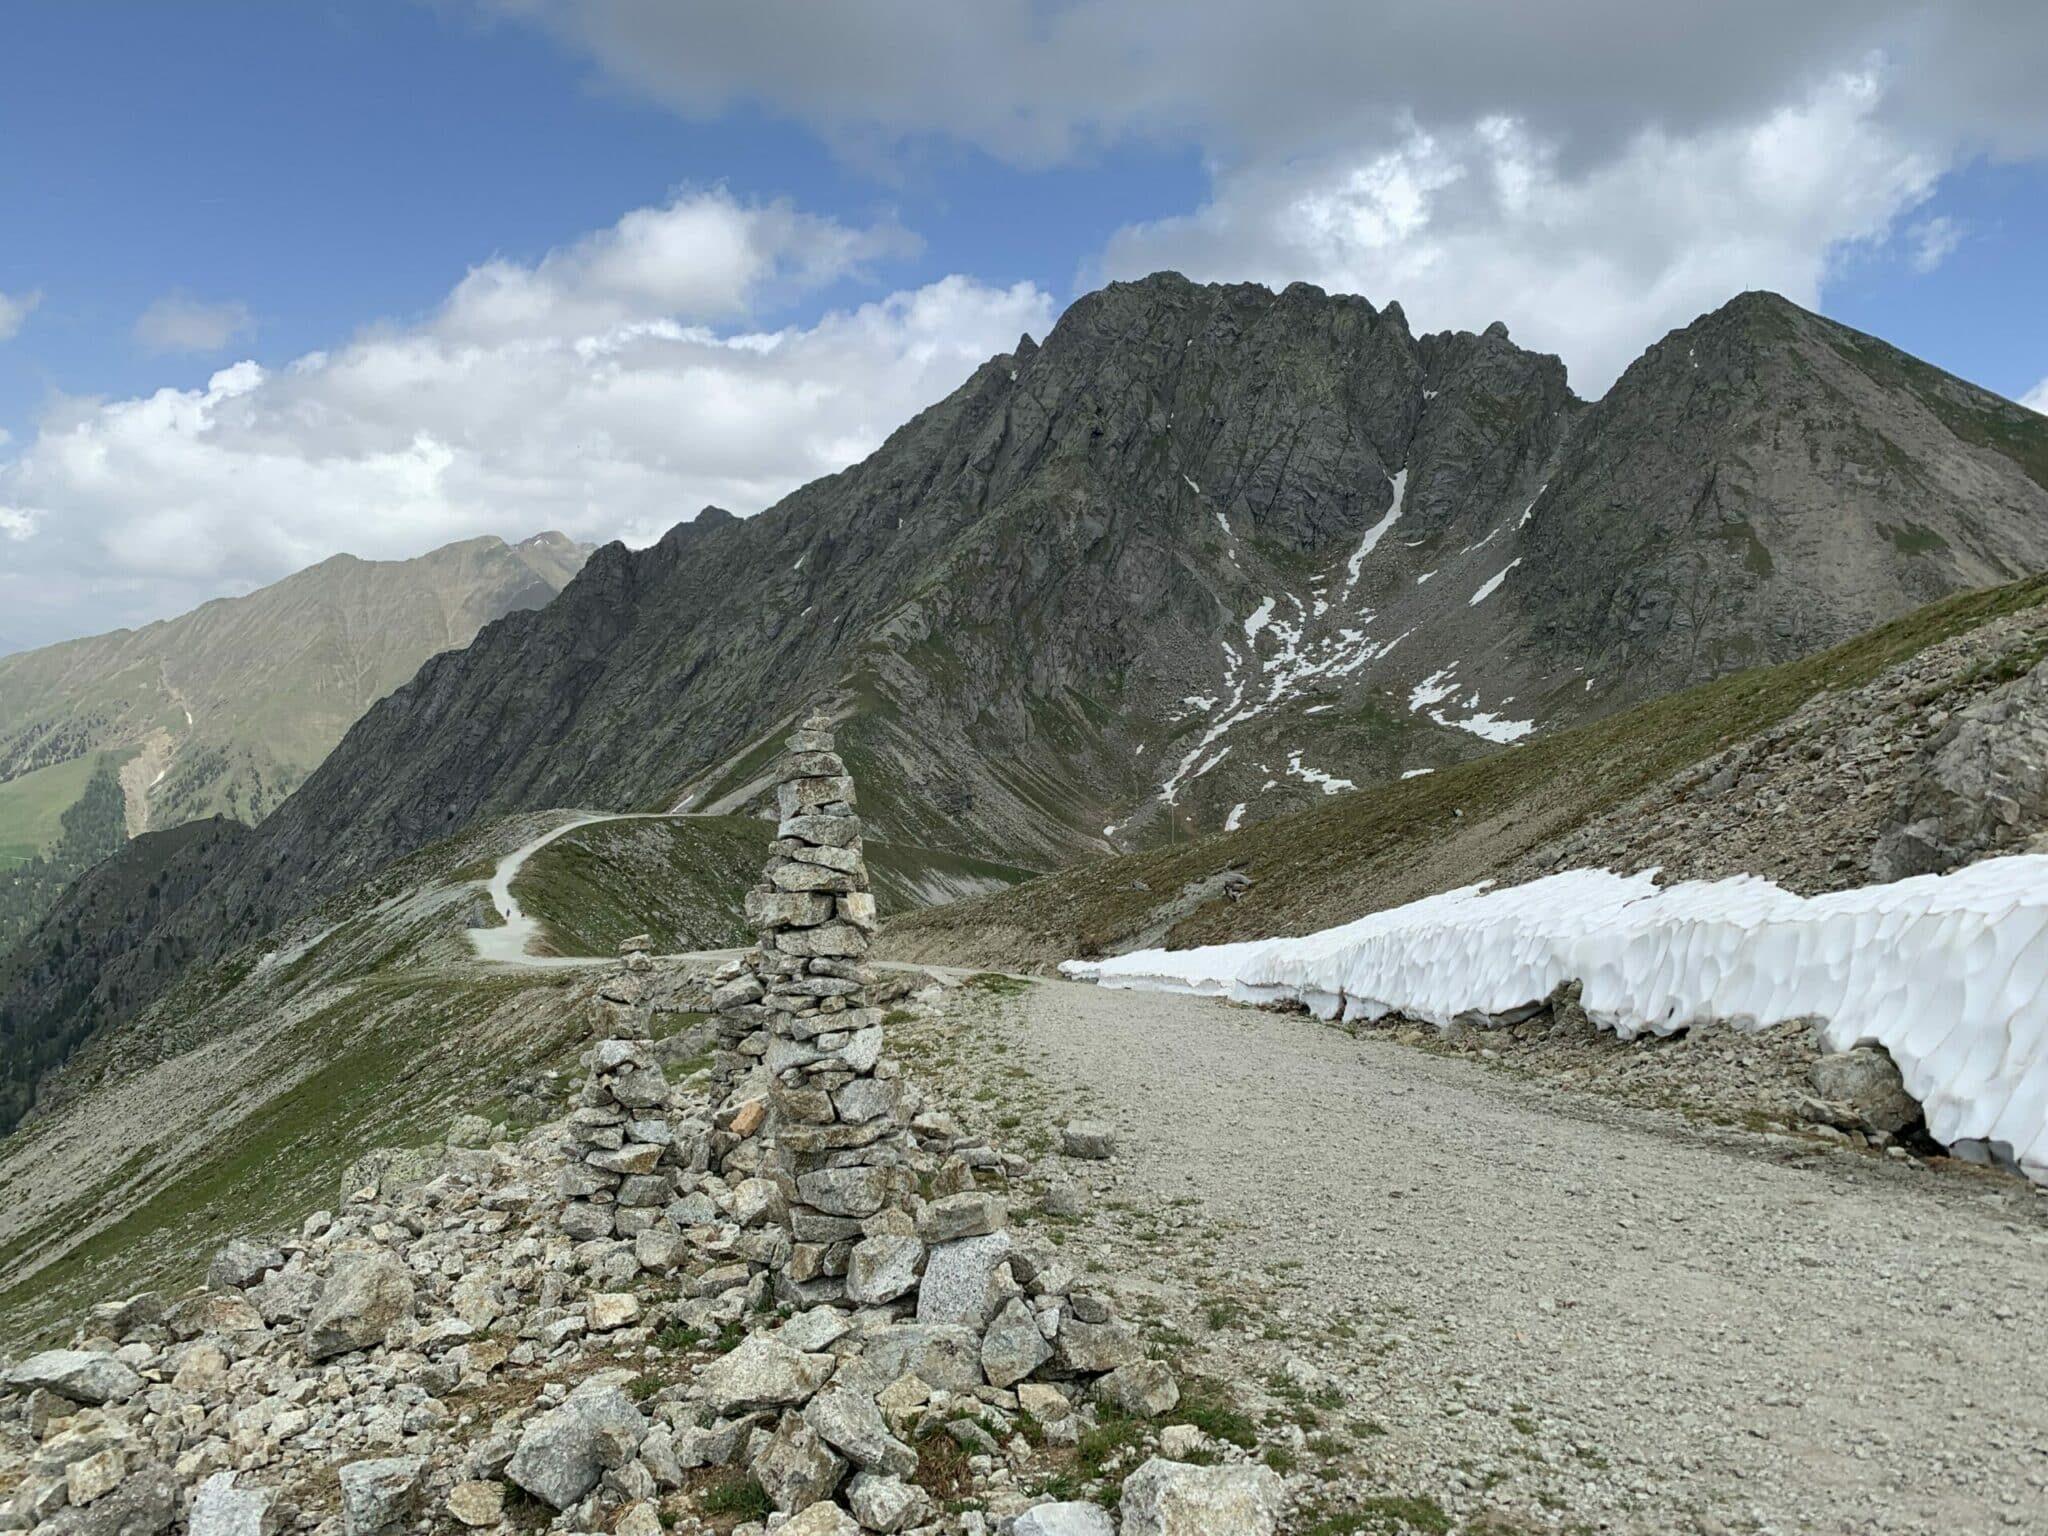 Meran 2000 – Bergsee und Gipfelglück